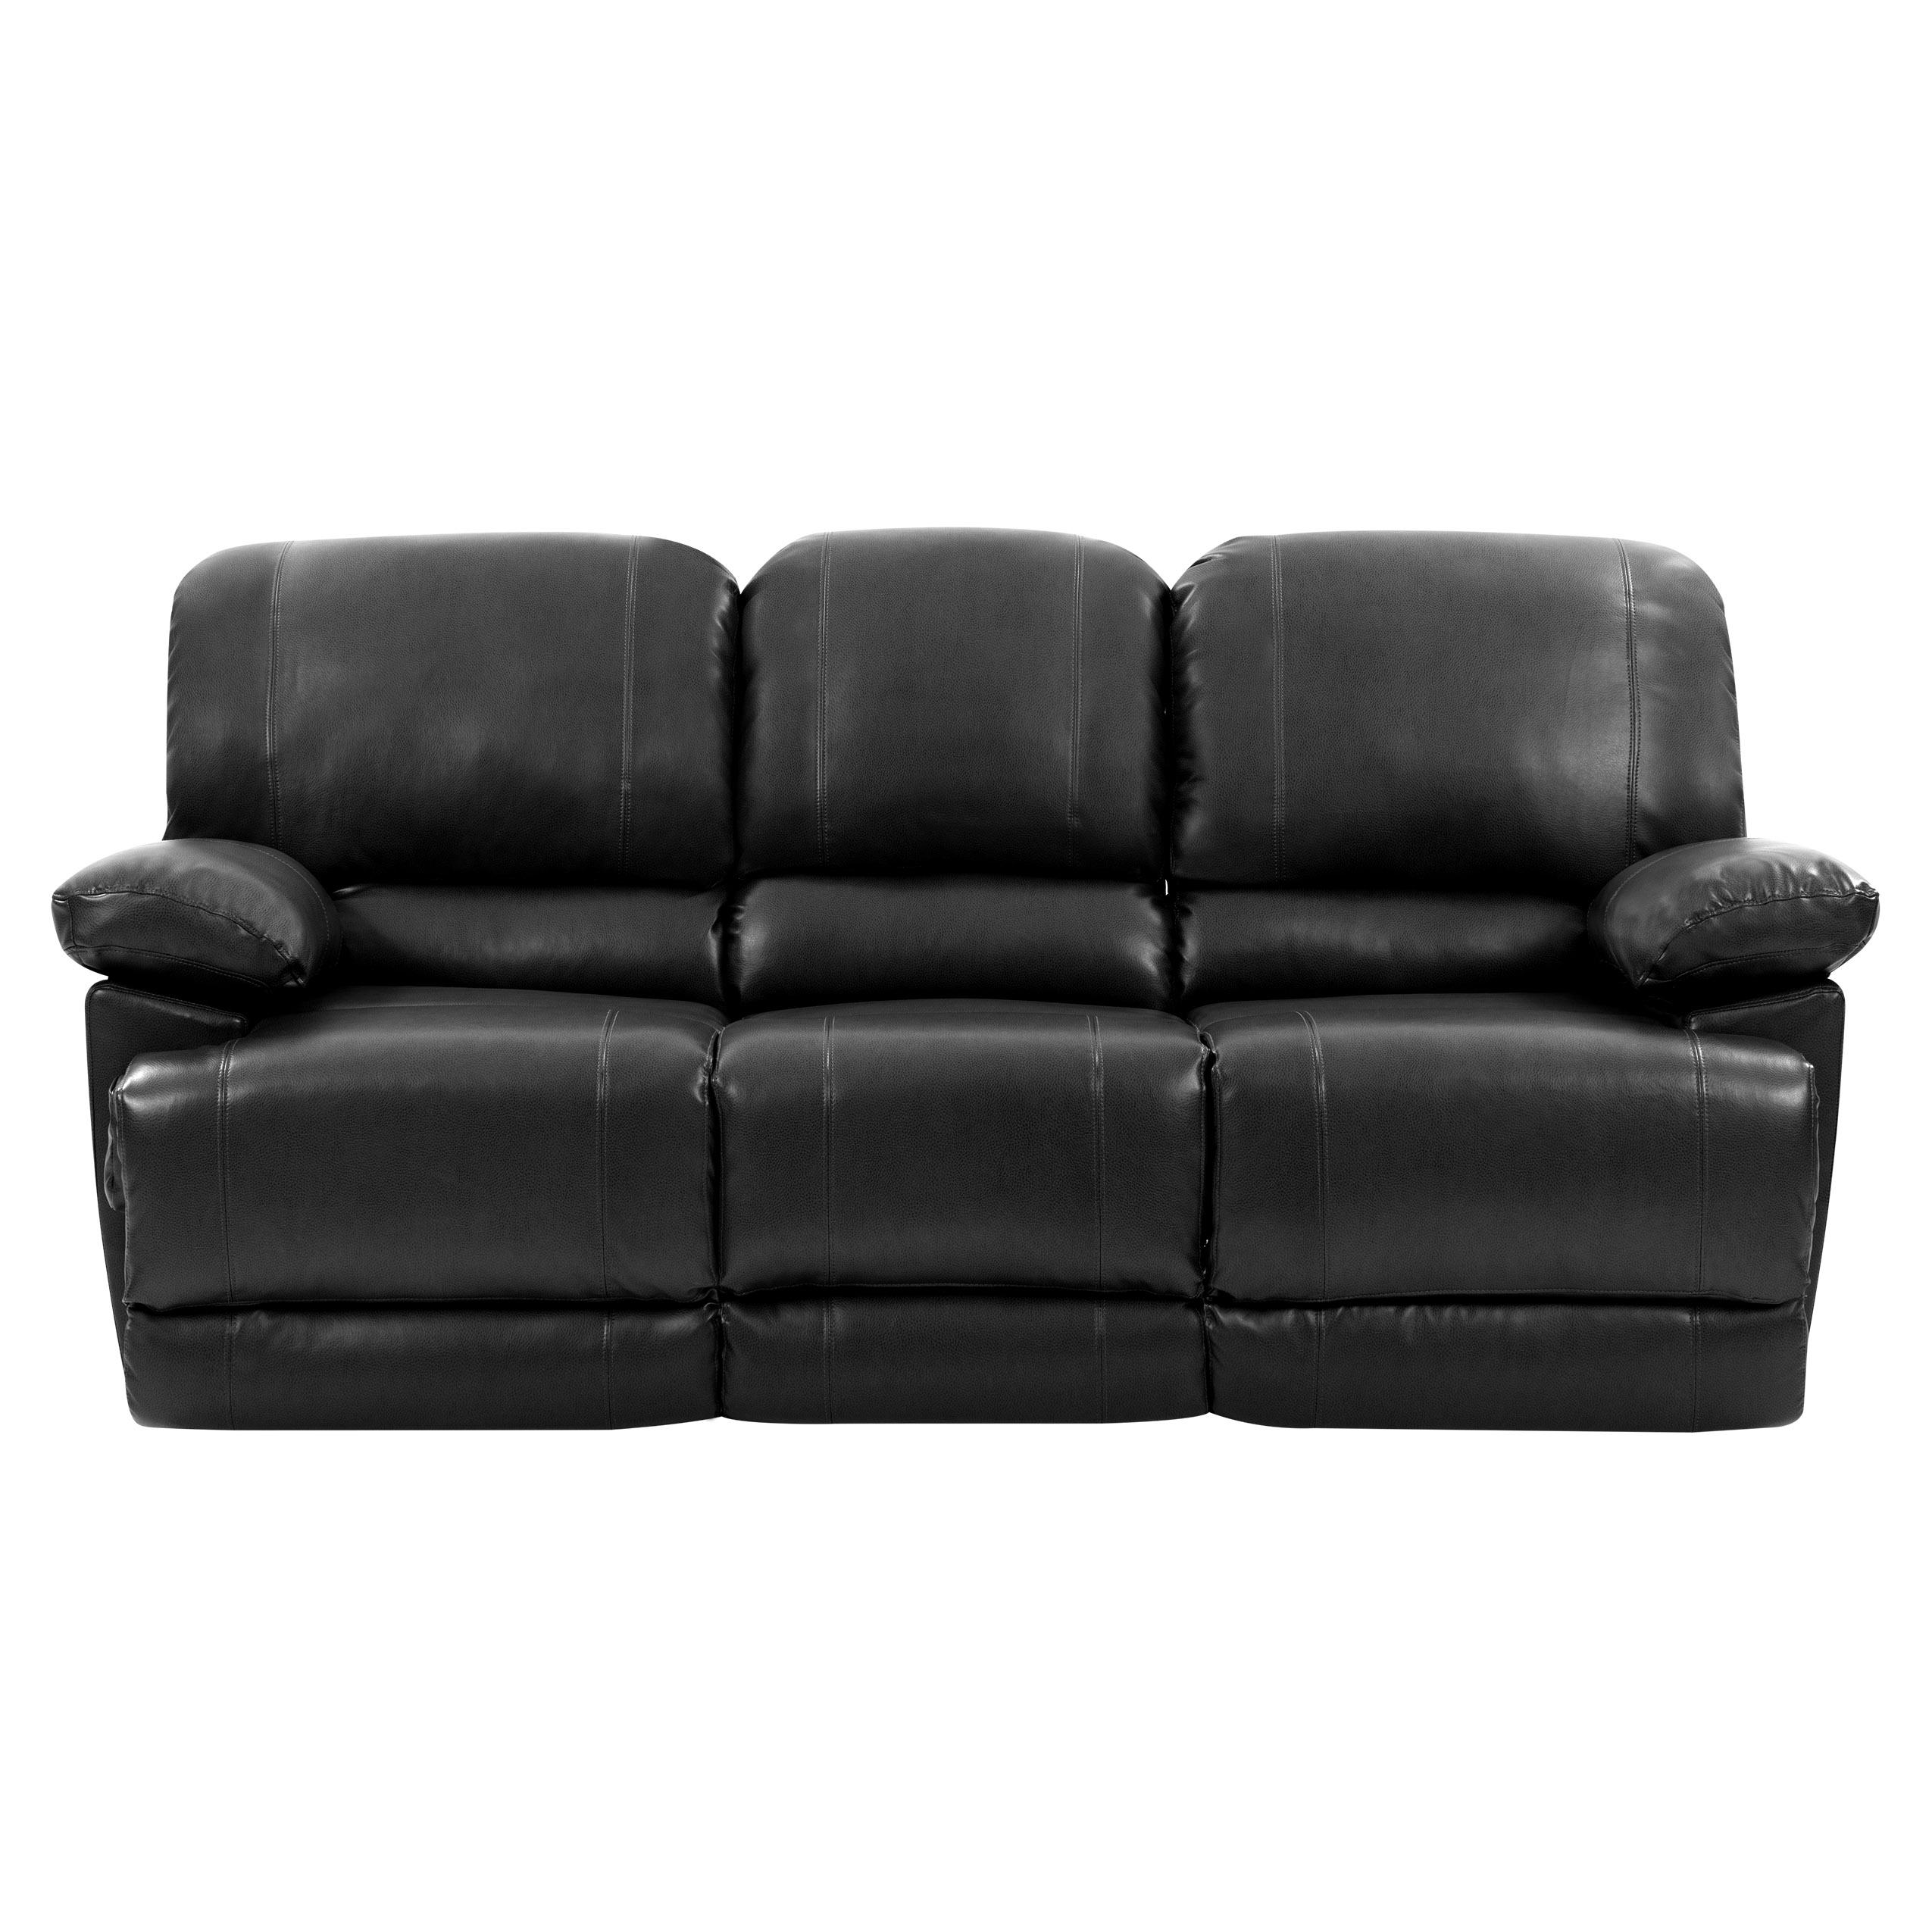 Corliving Plush Power Reclining Black Bonded Leather Sofa